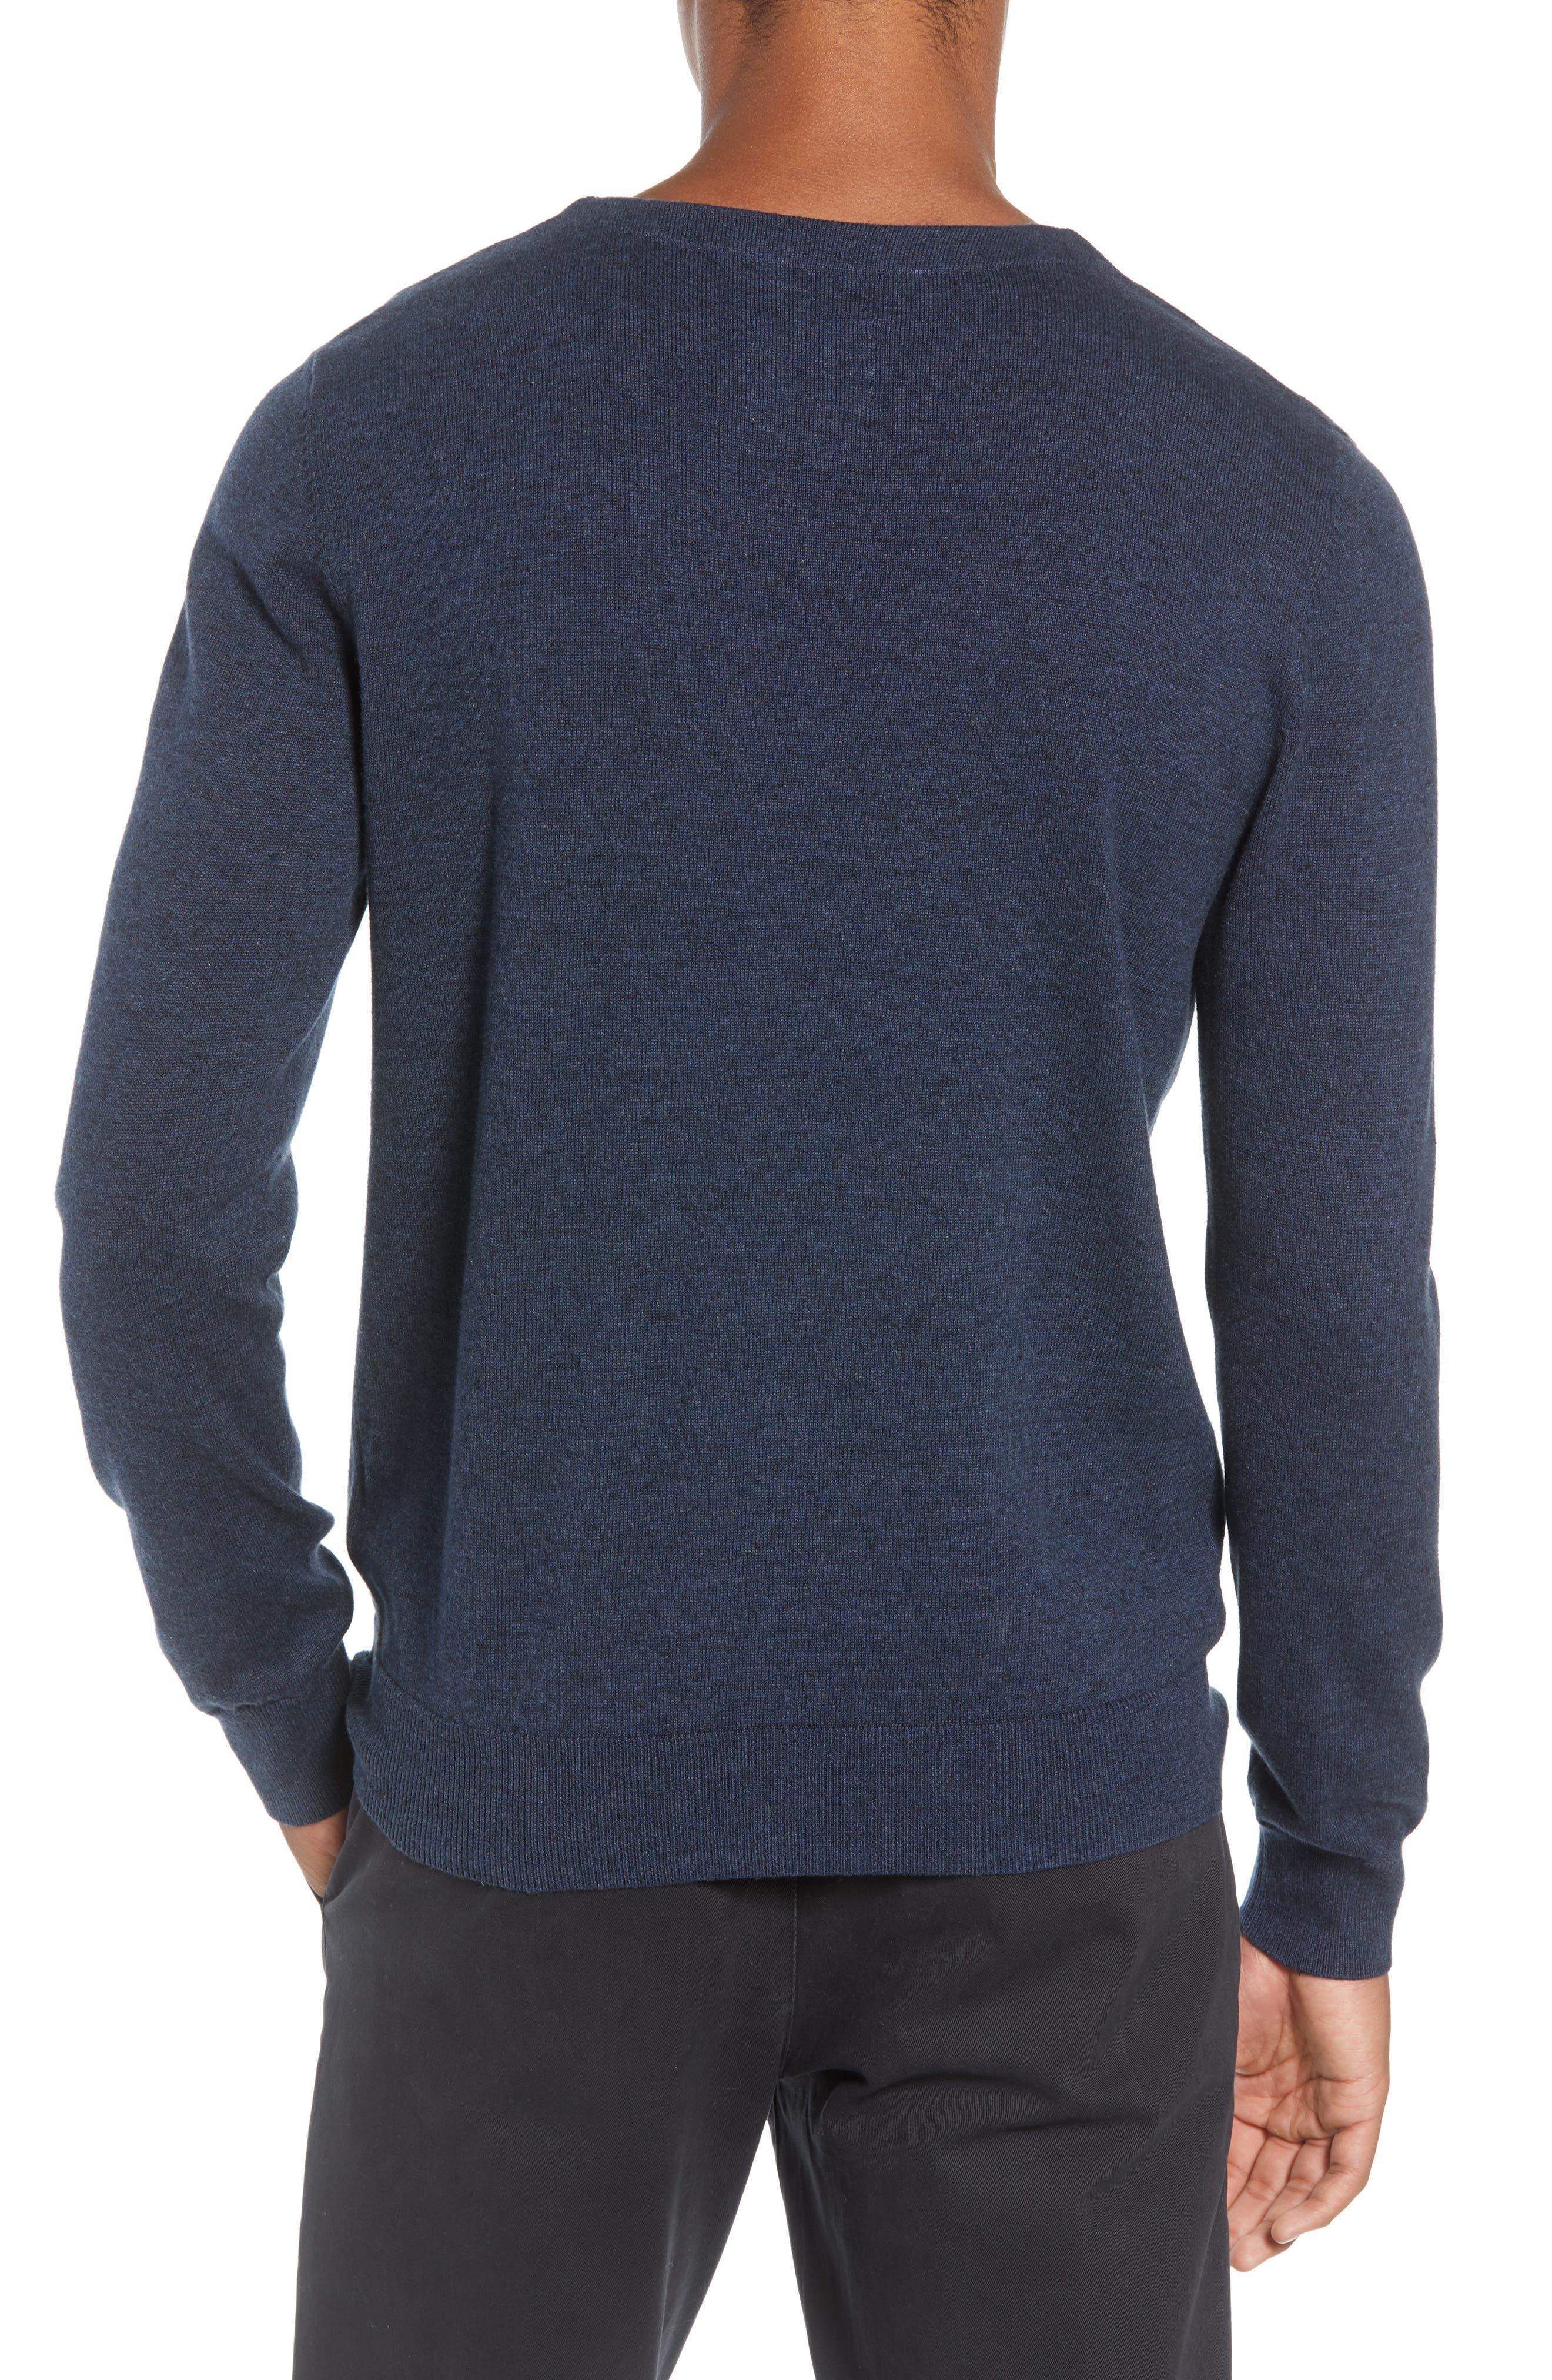 McGill Slim Fit Crewneck Sweater,                             Alternate thumbnail 2, color,                             HEATHER NAVY